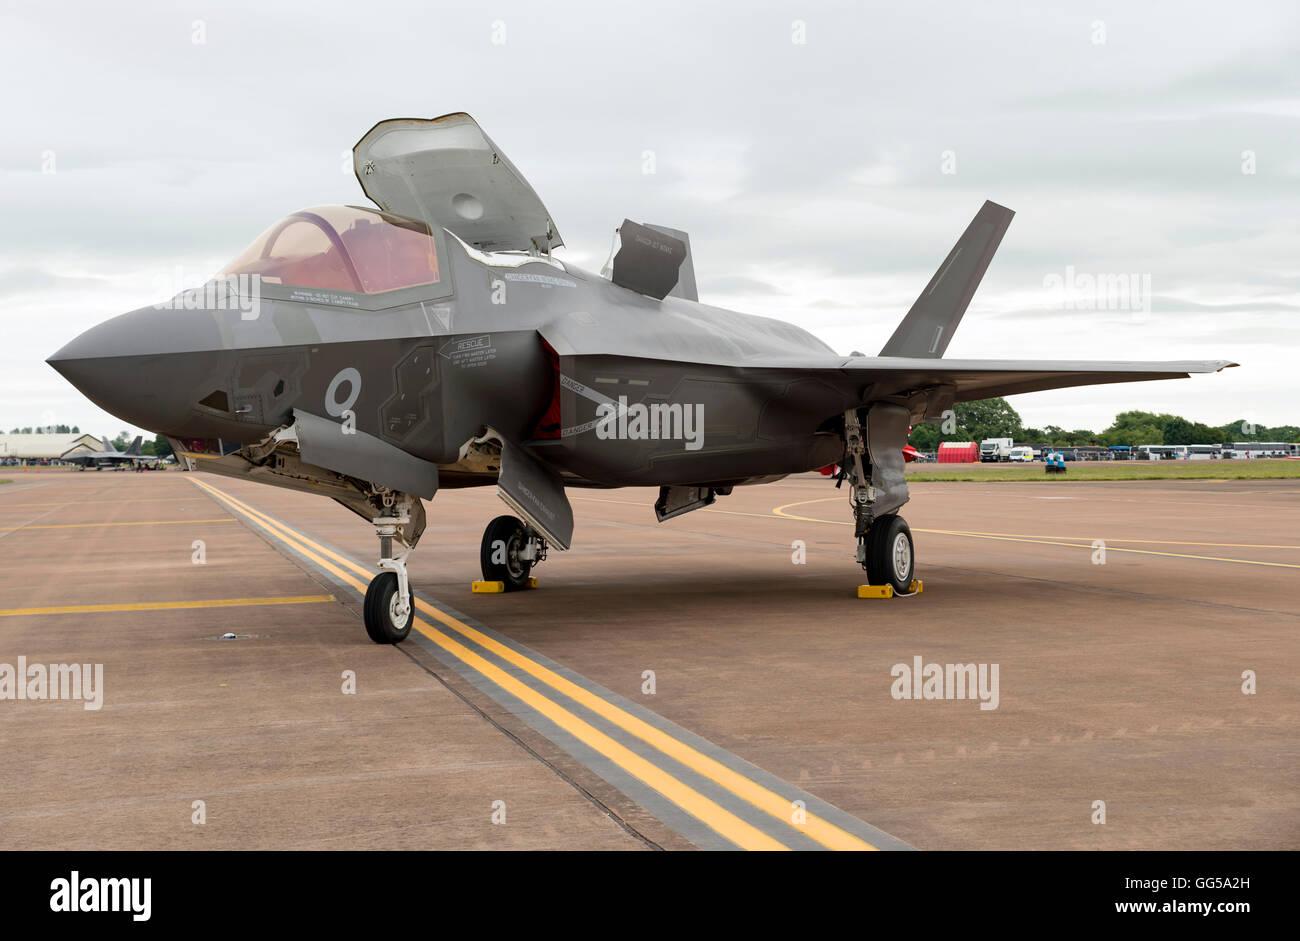 F35B Lightning II destined for Royal Navy/Royal Air Force at the Royal International air Tattoo 2016 - Stock Image